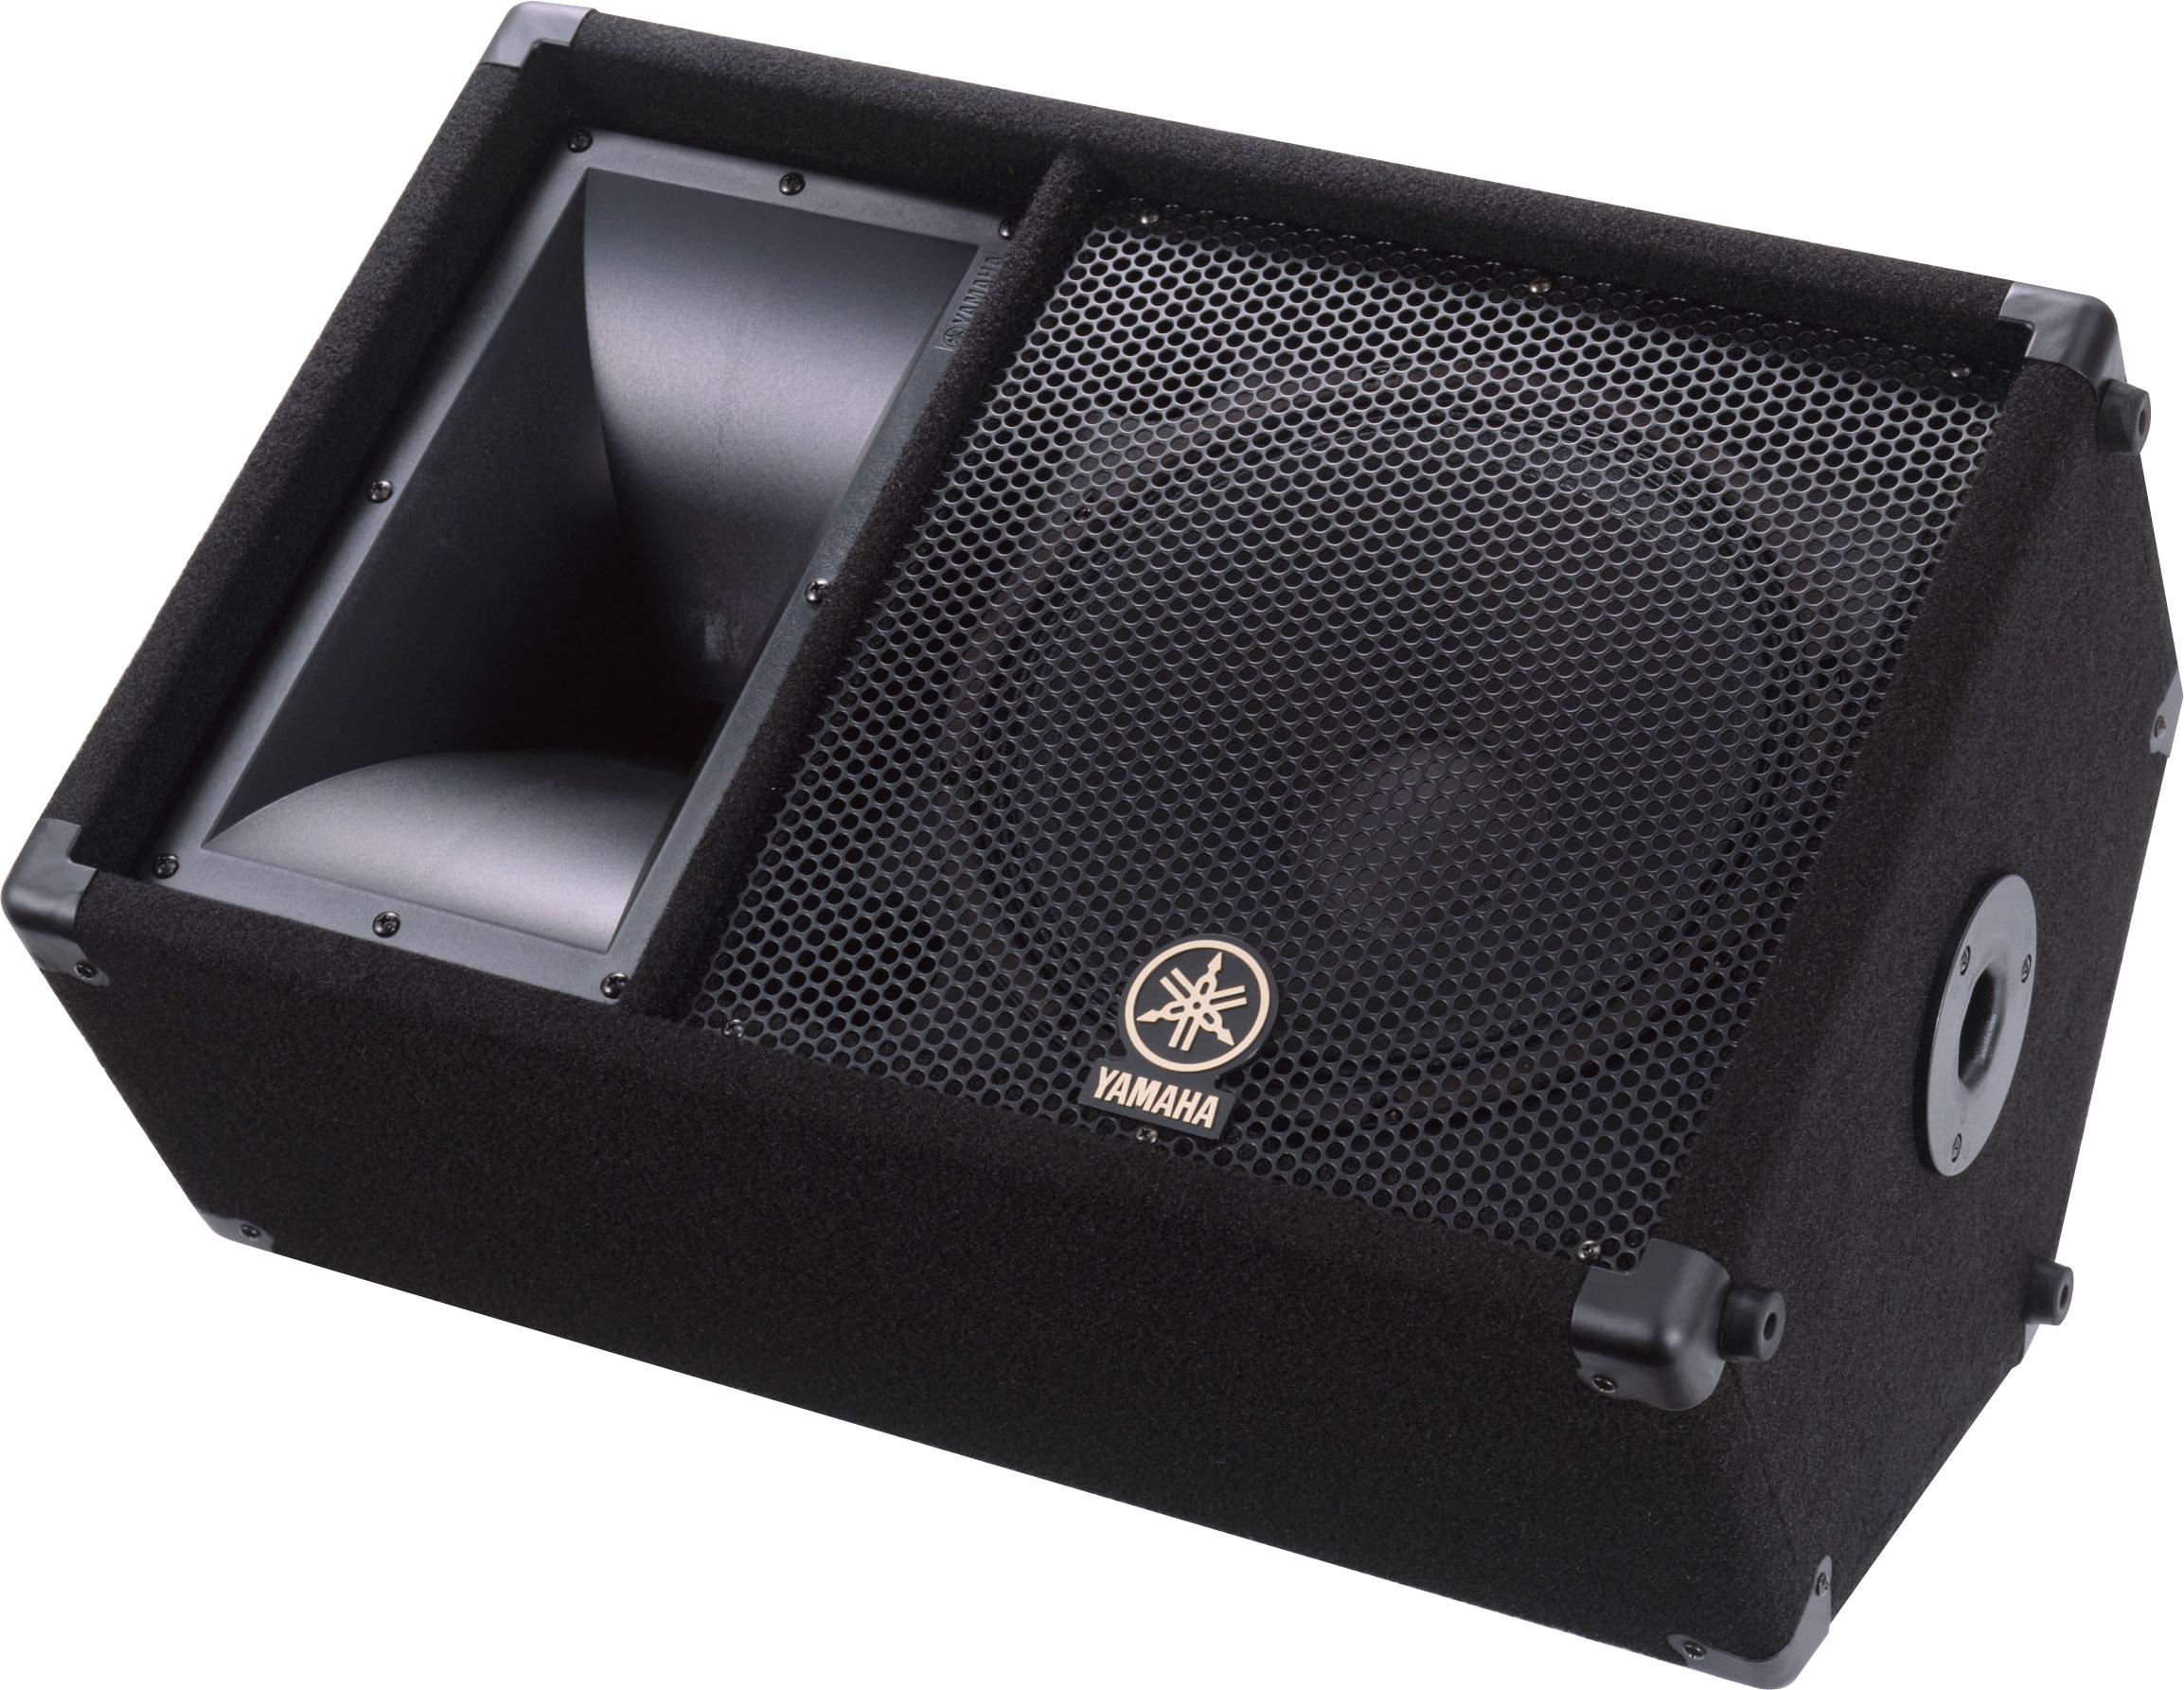 yamaha sm12v passive monitor speaker 12 700w max 8 ohm yamaha music london. Black Bedroom Furniture Sets. Home Design Ideas